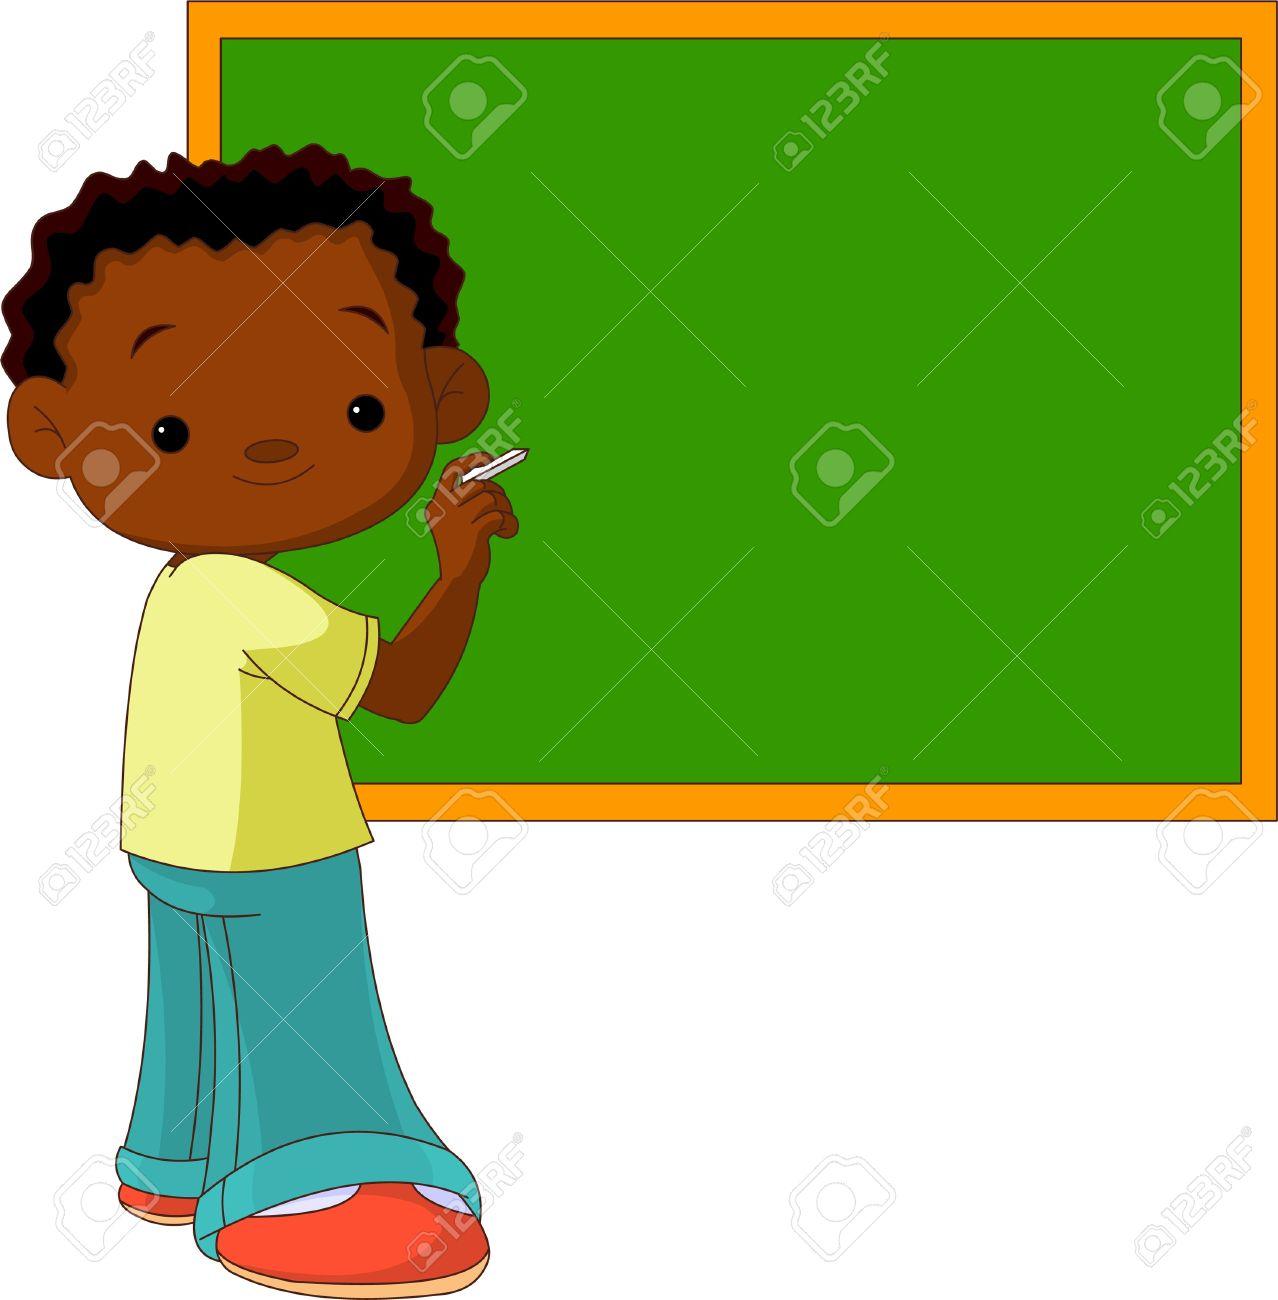 Cute Boy Writing Something on the Blackboard Stock Vector - 9782444